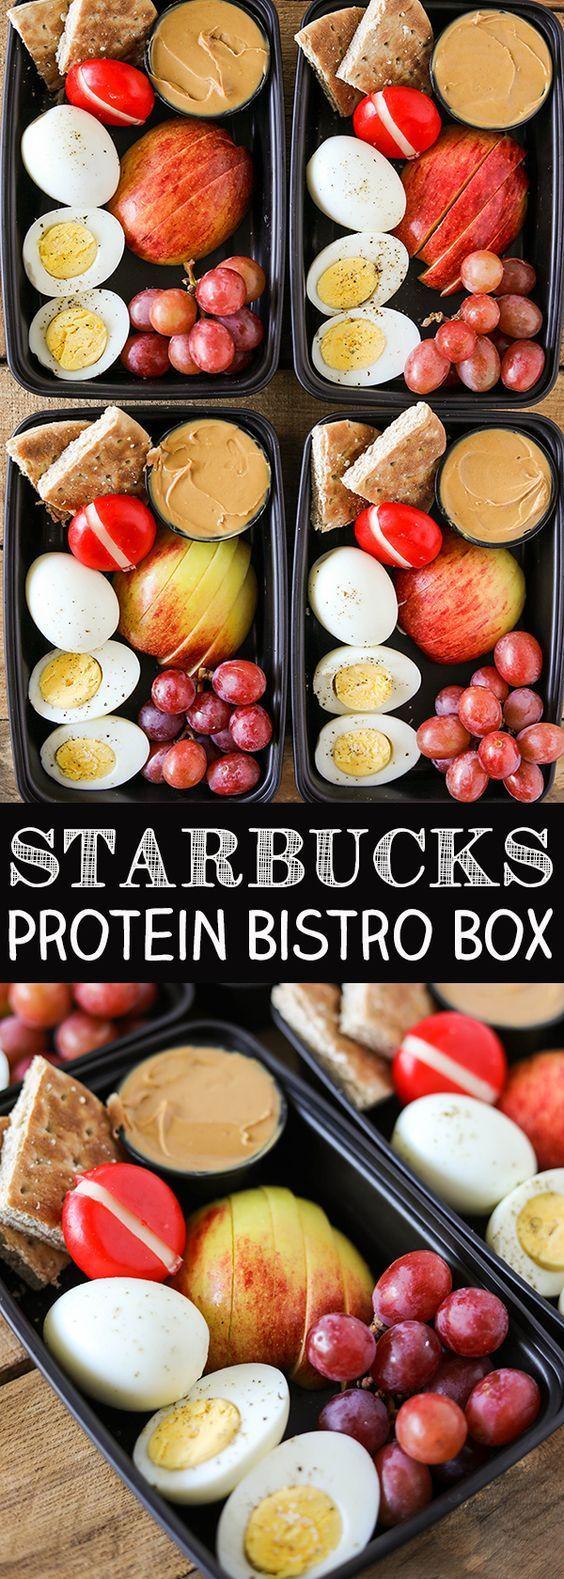 DIY Starbucks Protein Bistro Box images